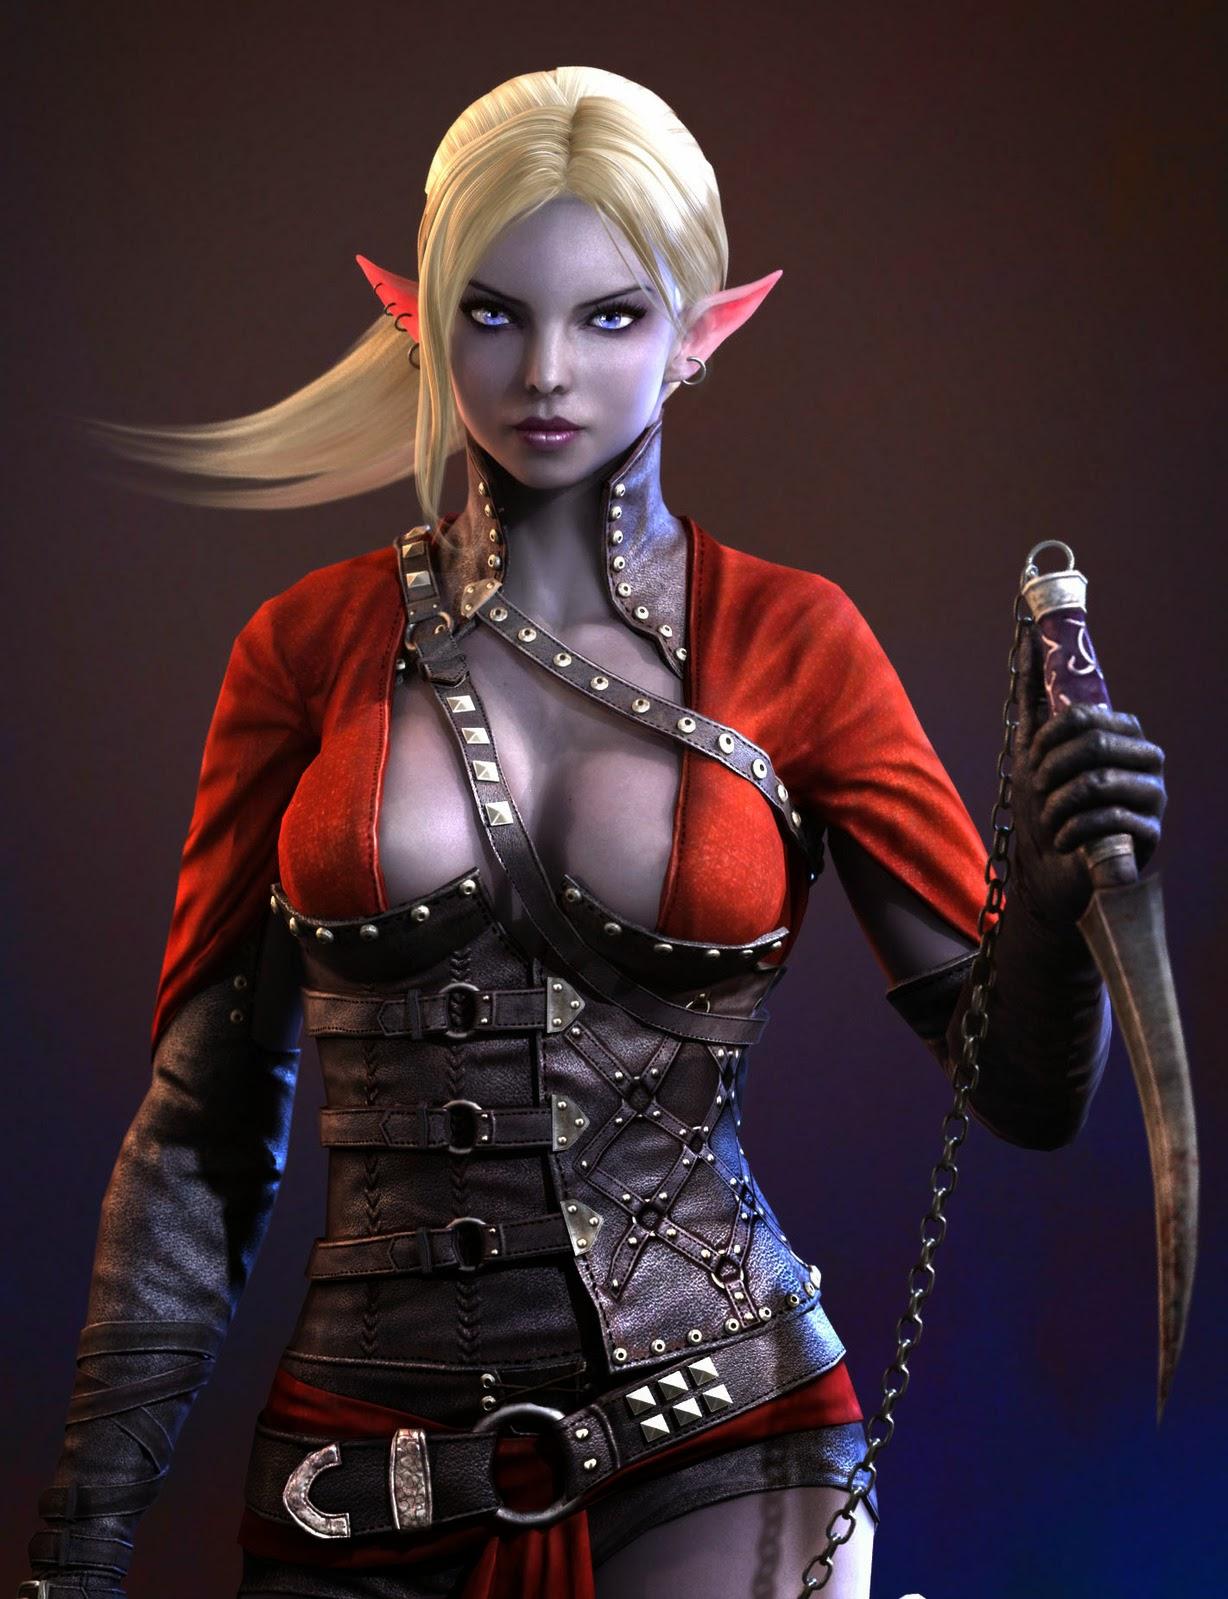 Hintergrundbilder Fantasy Elfen - Download winter wallpaper kostenlos downloaden Softonic